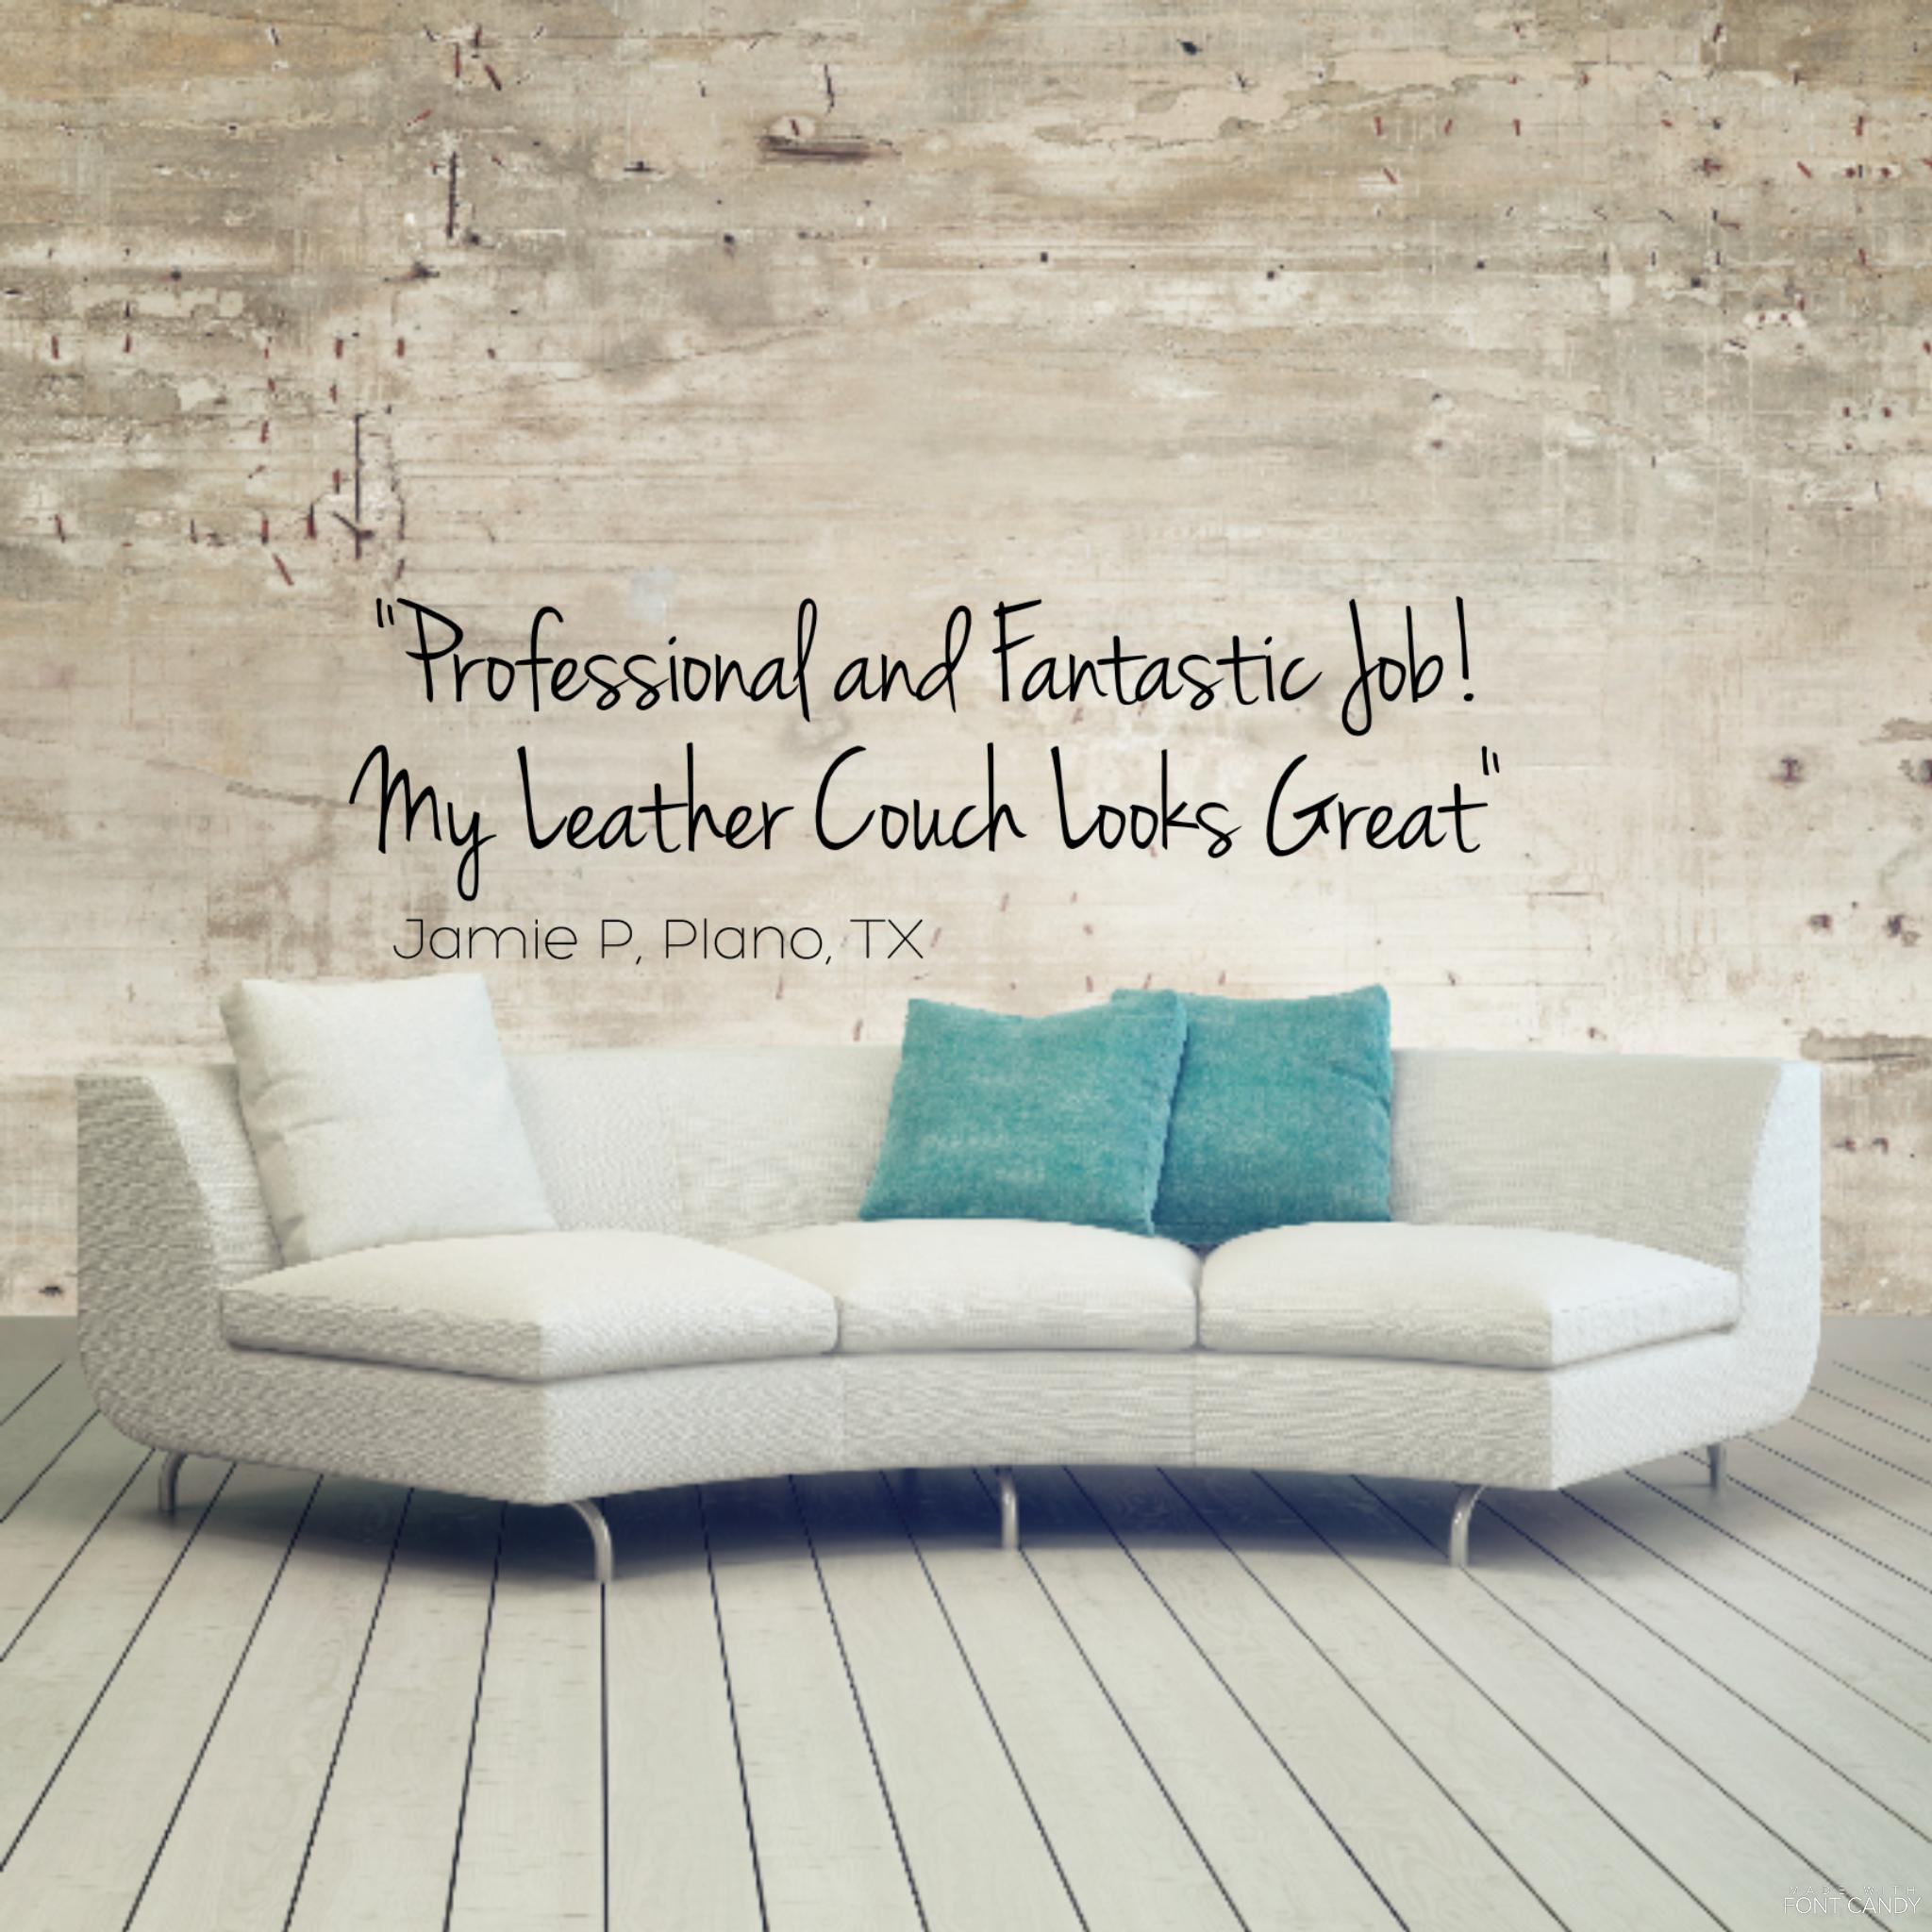 Exceptionnel Furniture Fixology, LLC